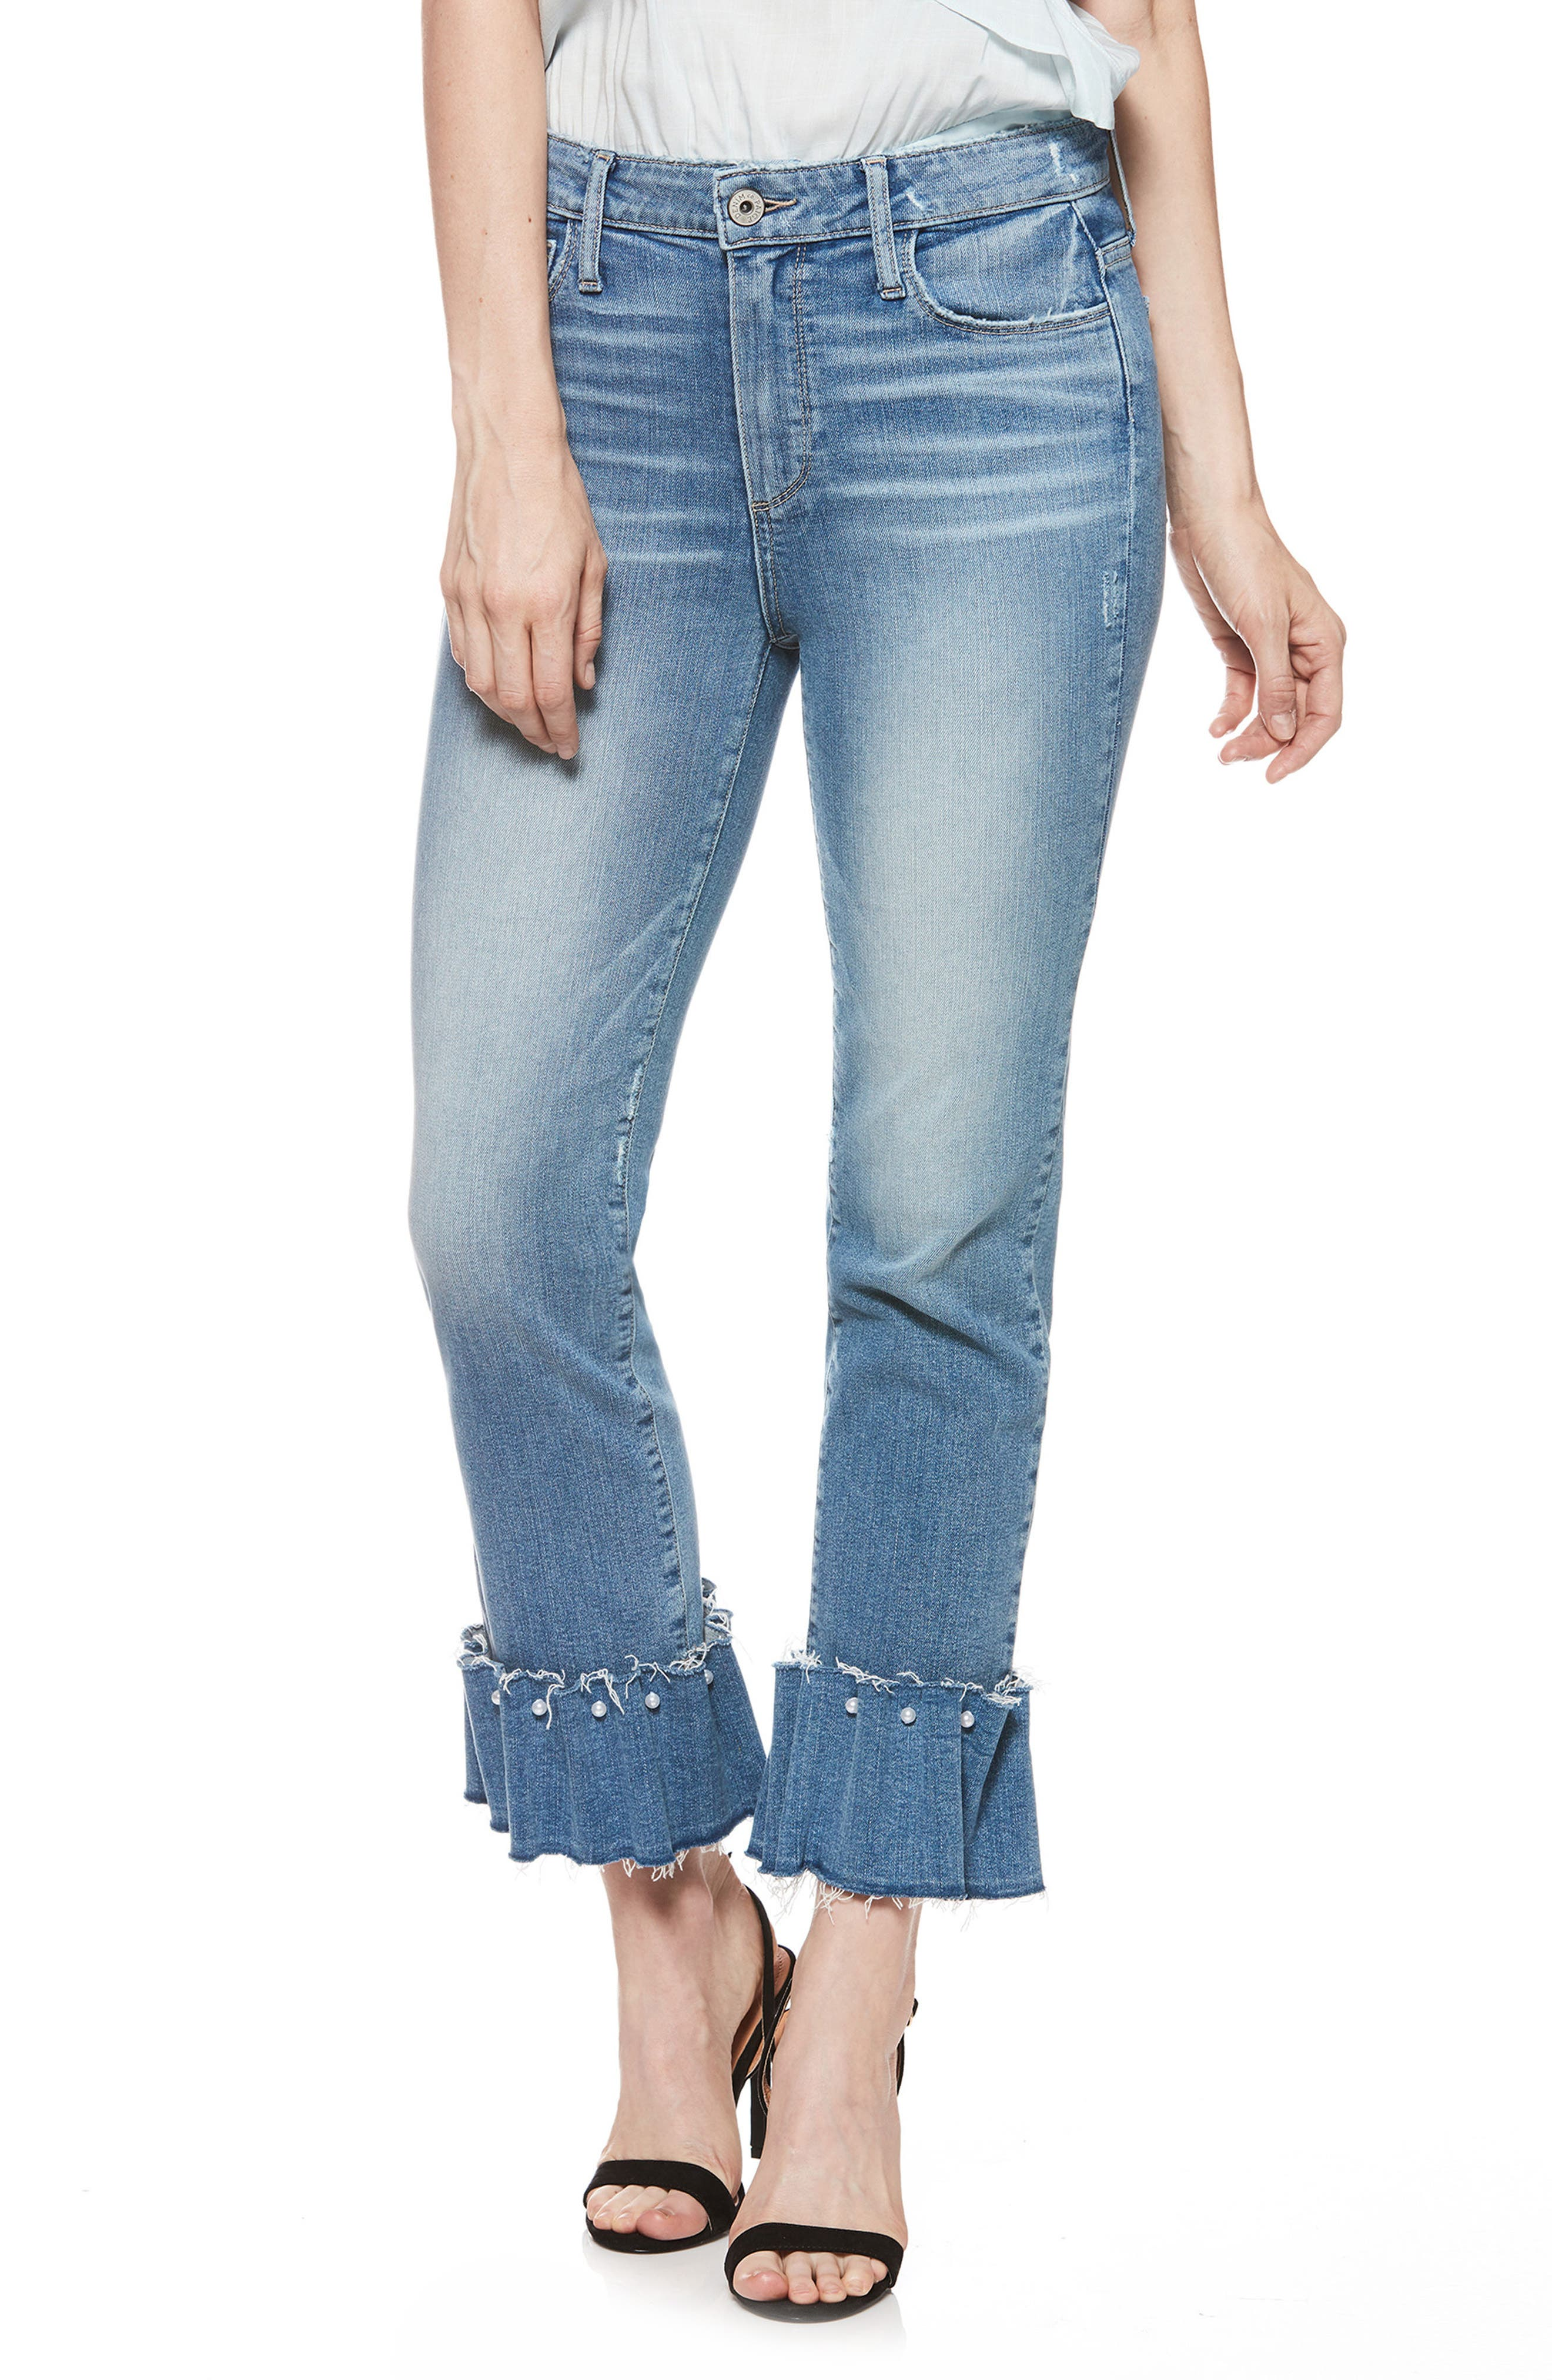 PAIGE Transcend Vintage - Hoxton Embellished Ruffle High Waist Jeans (Palms)